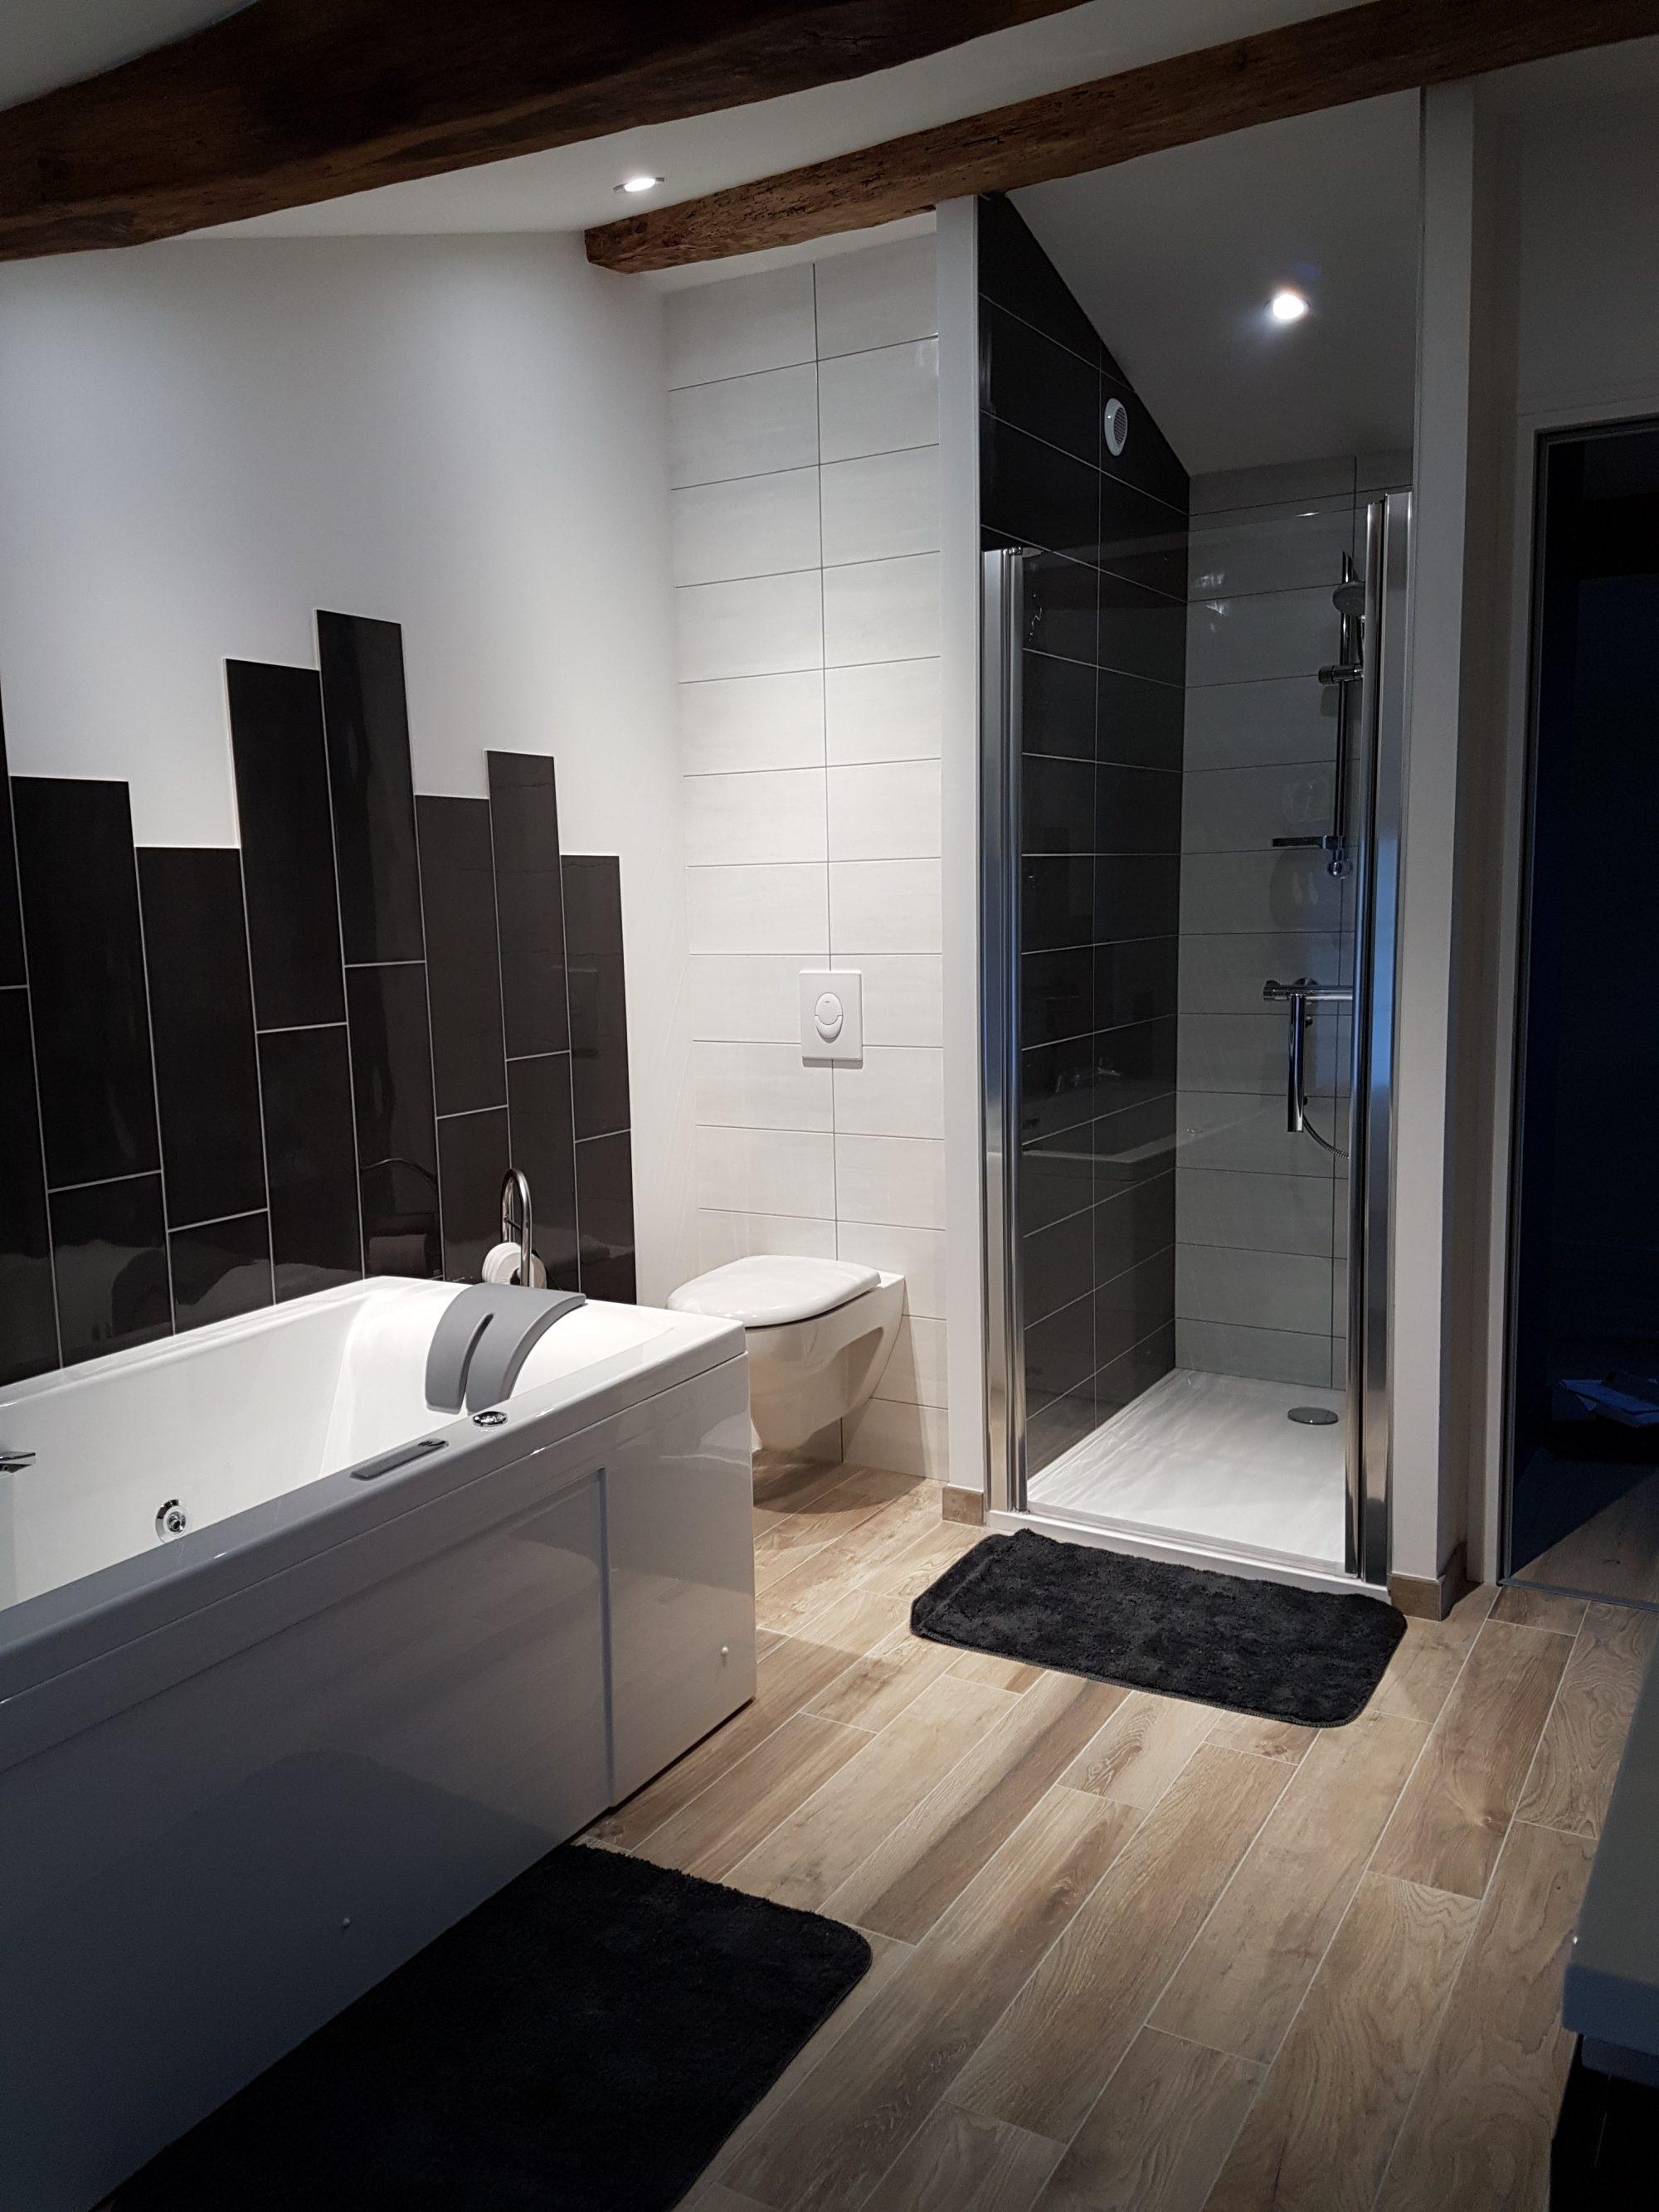 Installateur de Salle de bain et salle de bain PMR Niort - 20 - Grayco